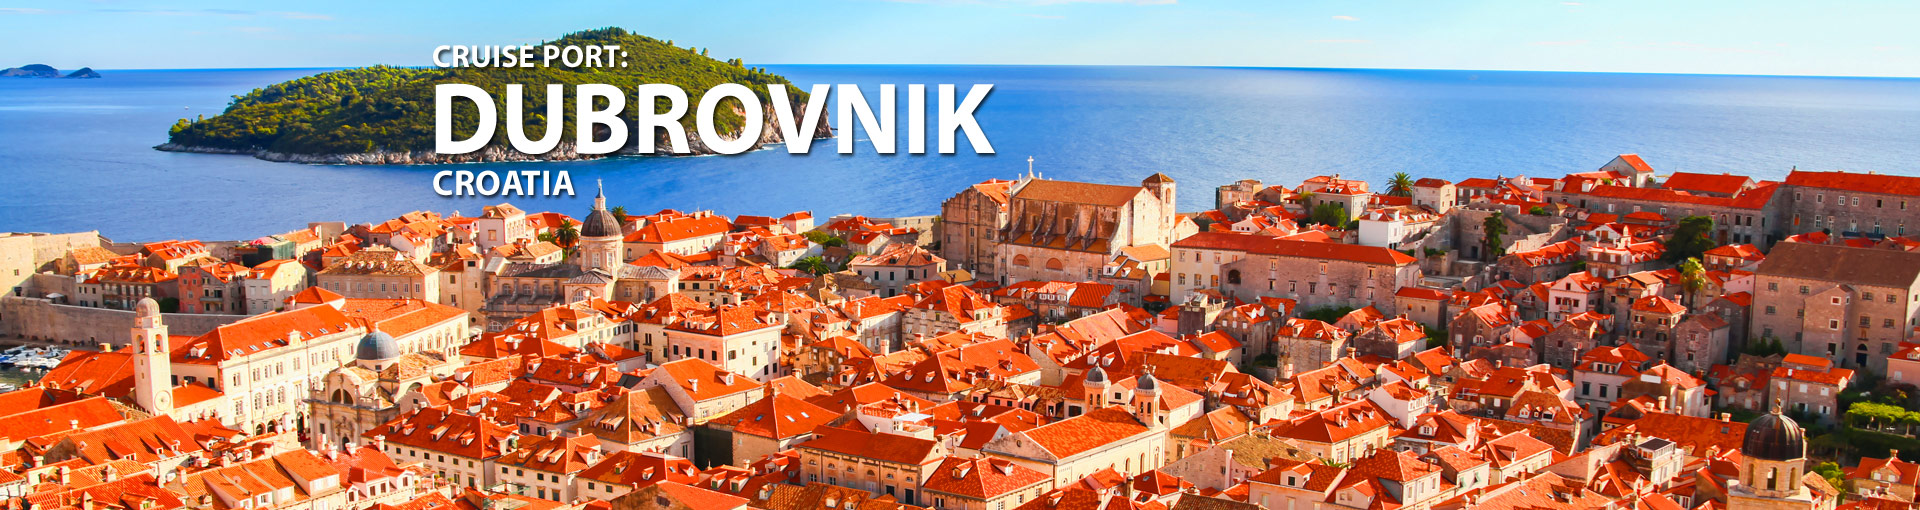 Cruises to Dubrovnik, Croatia